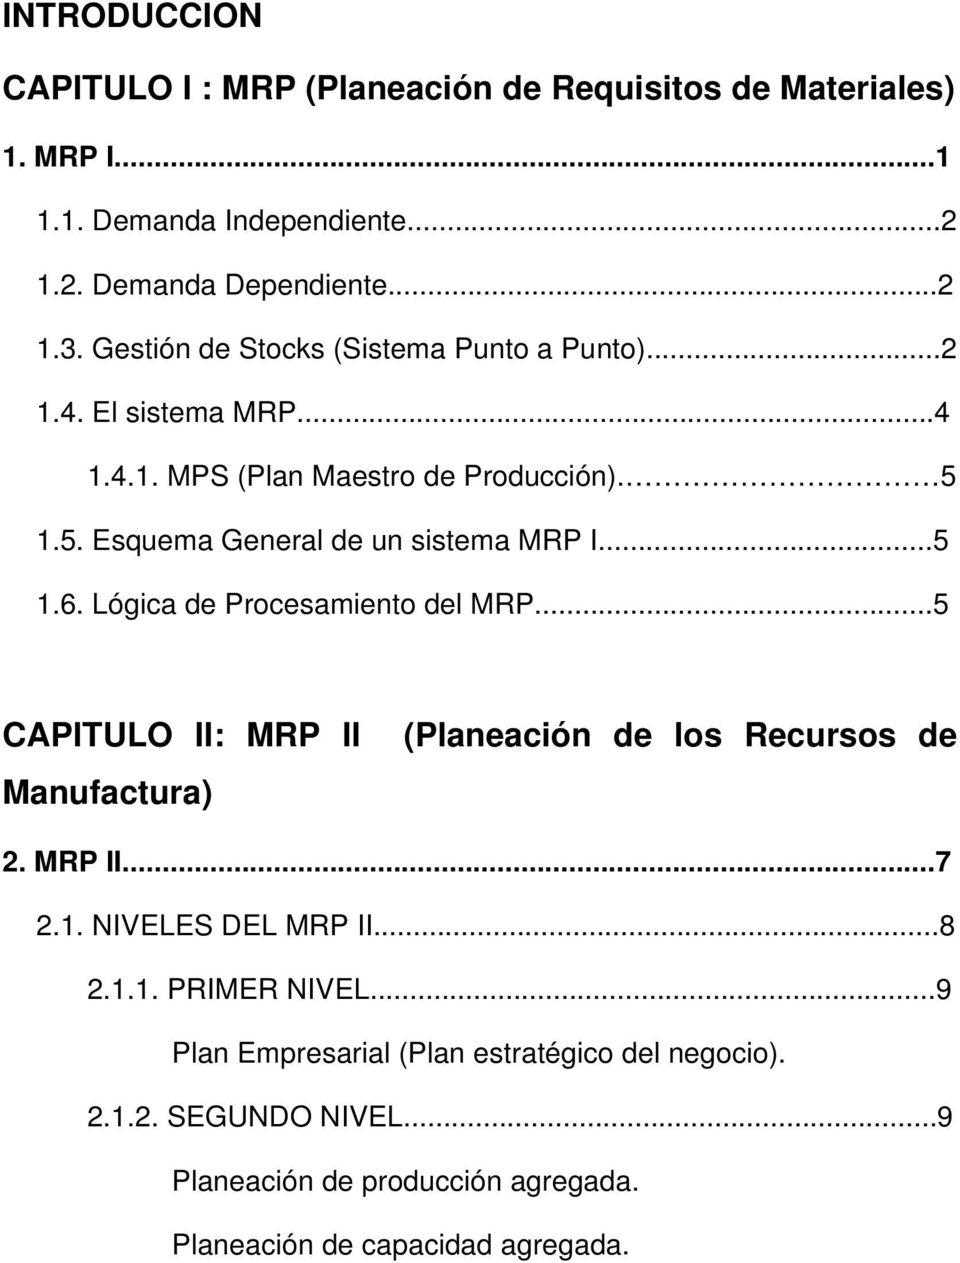 medium resolution of l gica de procesamiento del mrp 5 capitulo ii